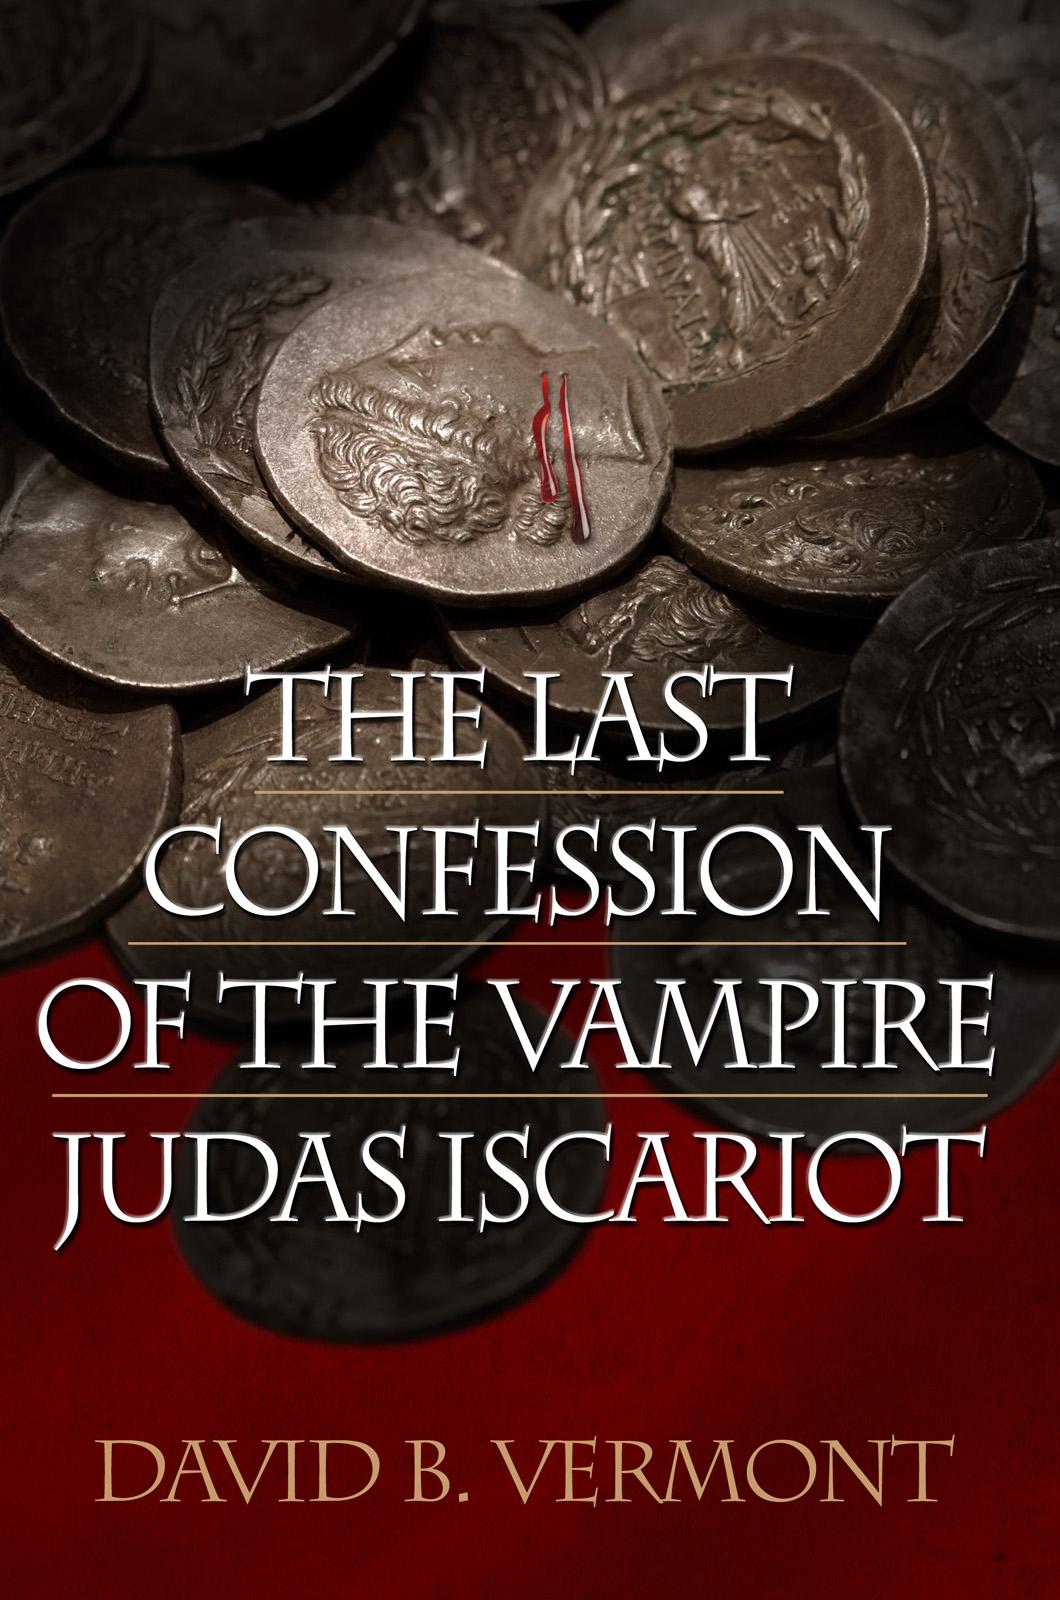 The Last Confession of the Vampire Judas Iscariot